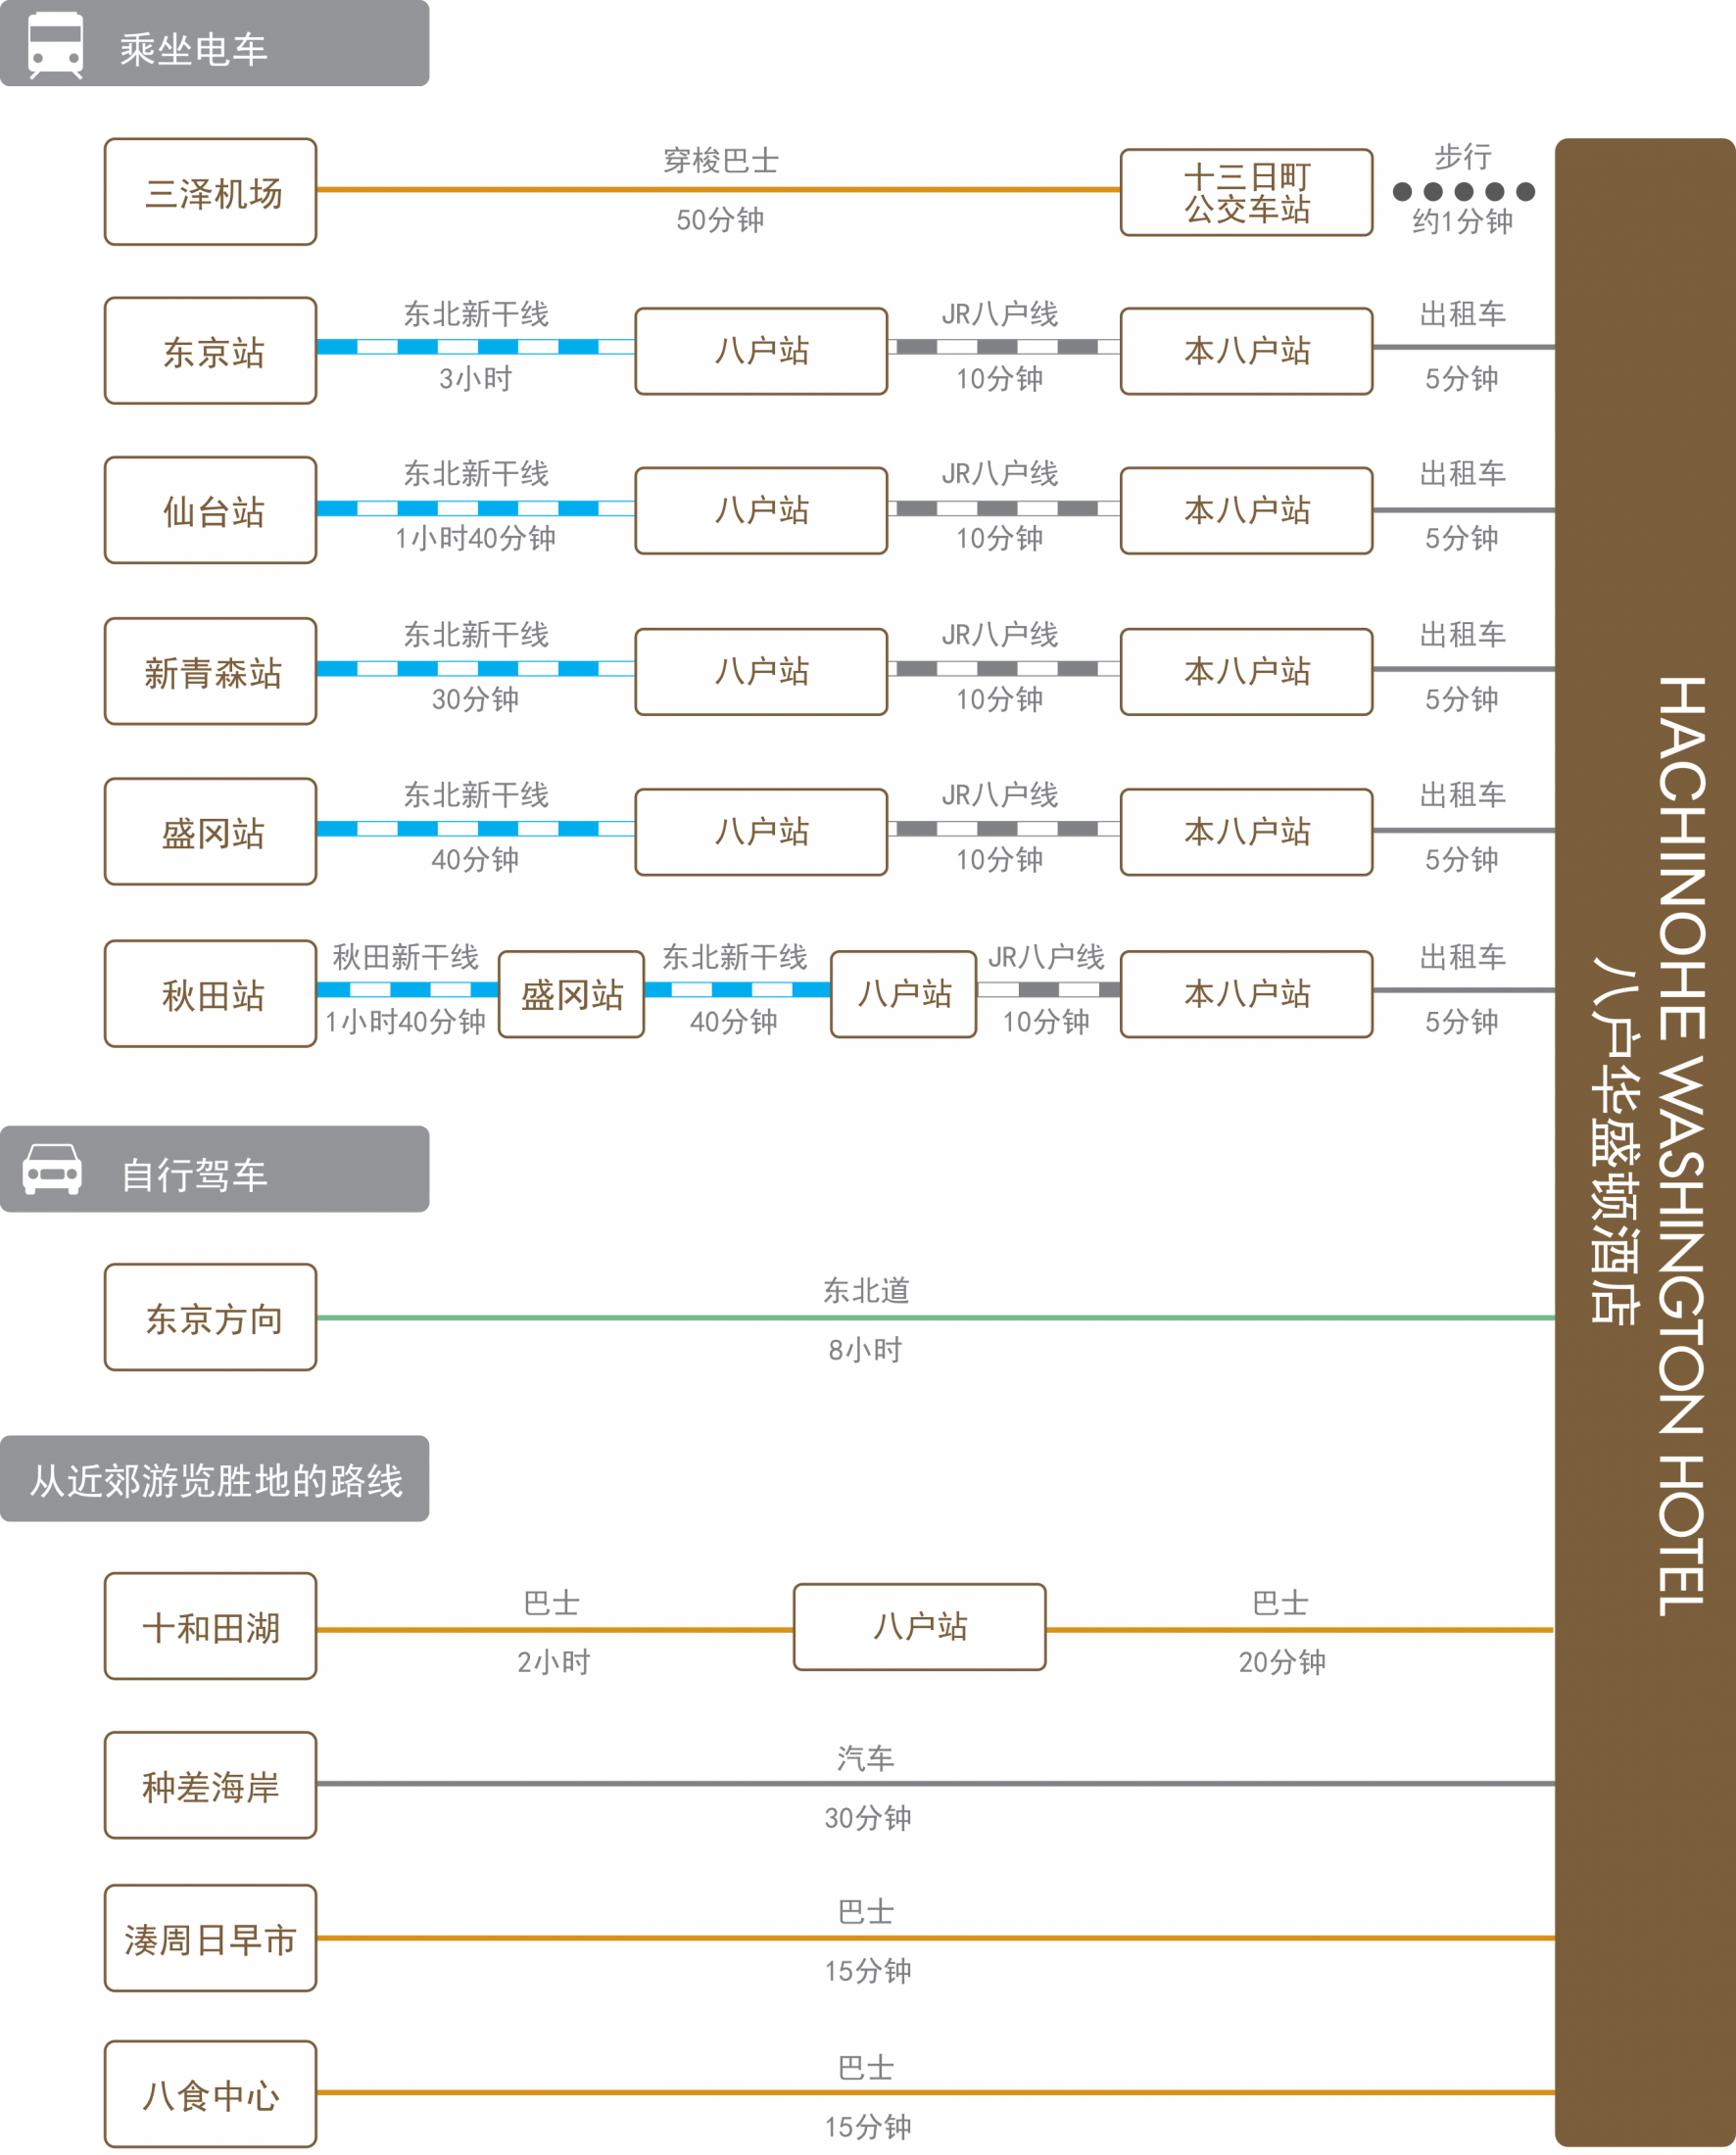 chart_zh_cn_hachinohe_wh